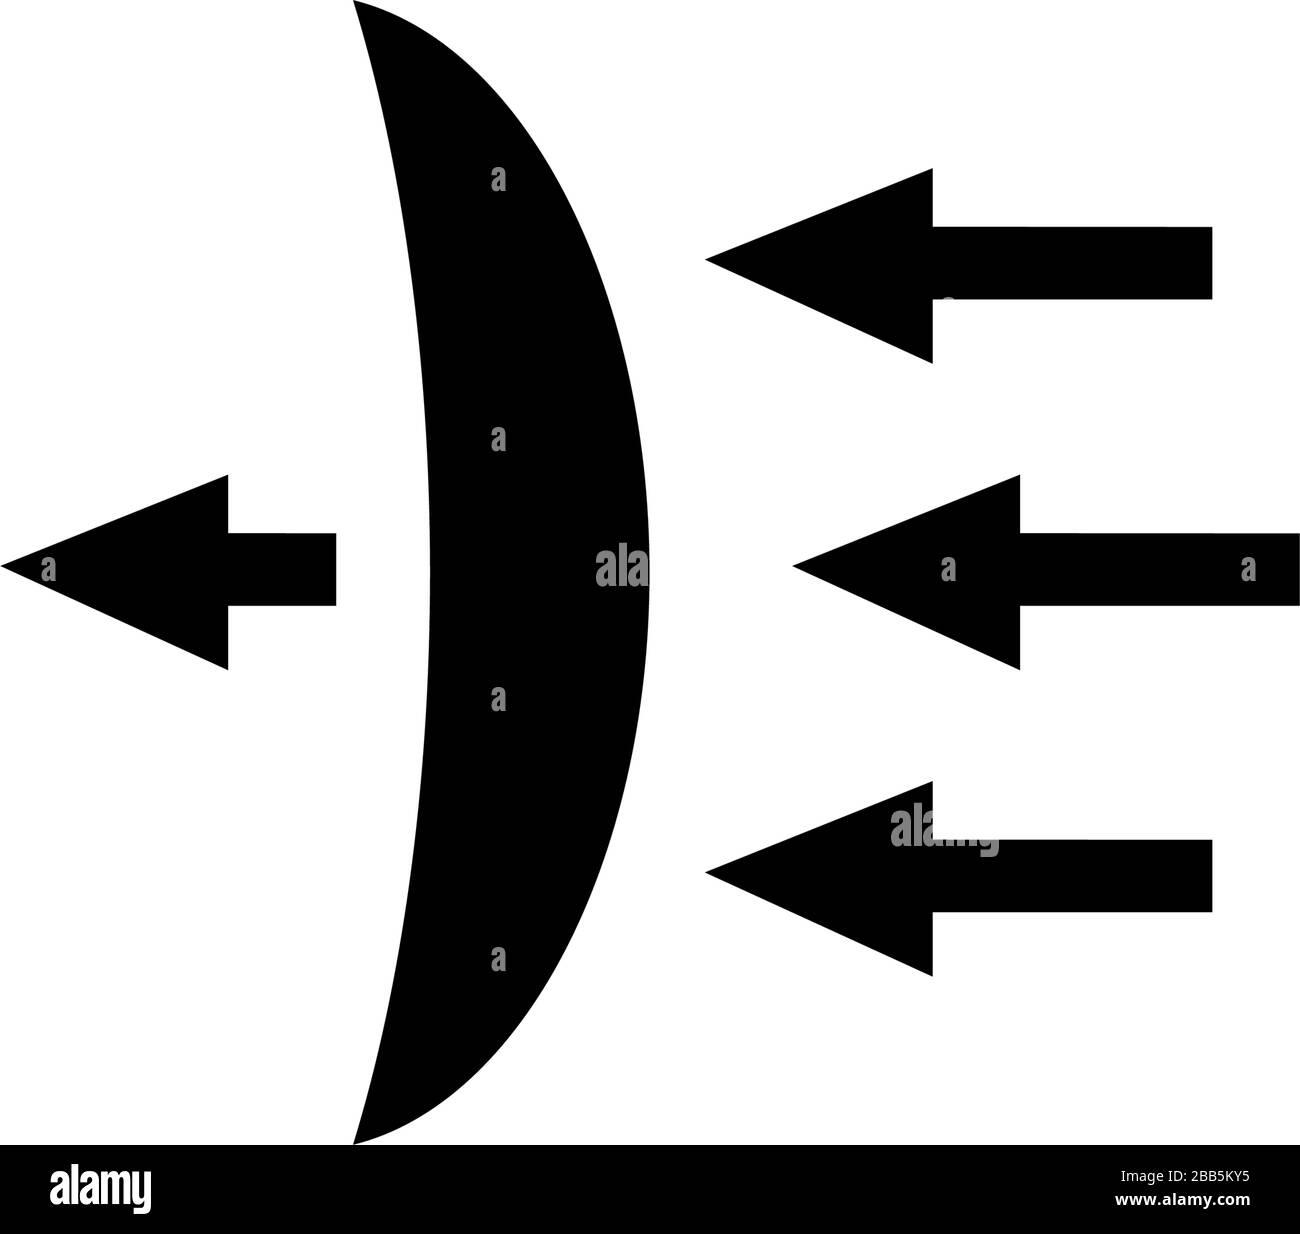 Contact Lens Light Transmission Dispersion Flat Vector Icon Illustration Simple Black Symbol On White Background Contact Lens Light Transmission S Stock Vector Image Art Alamy